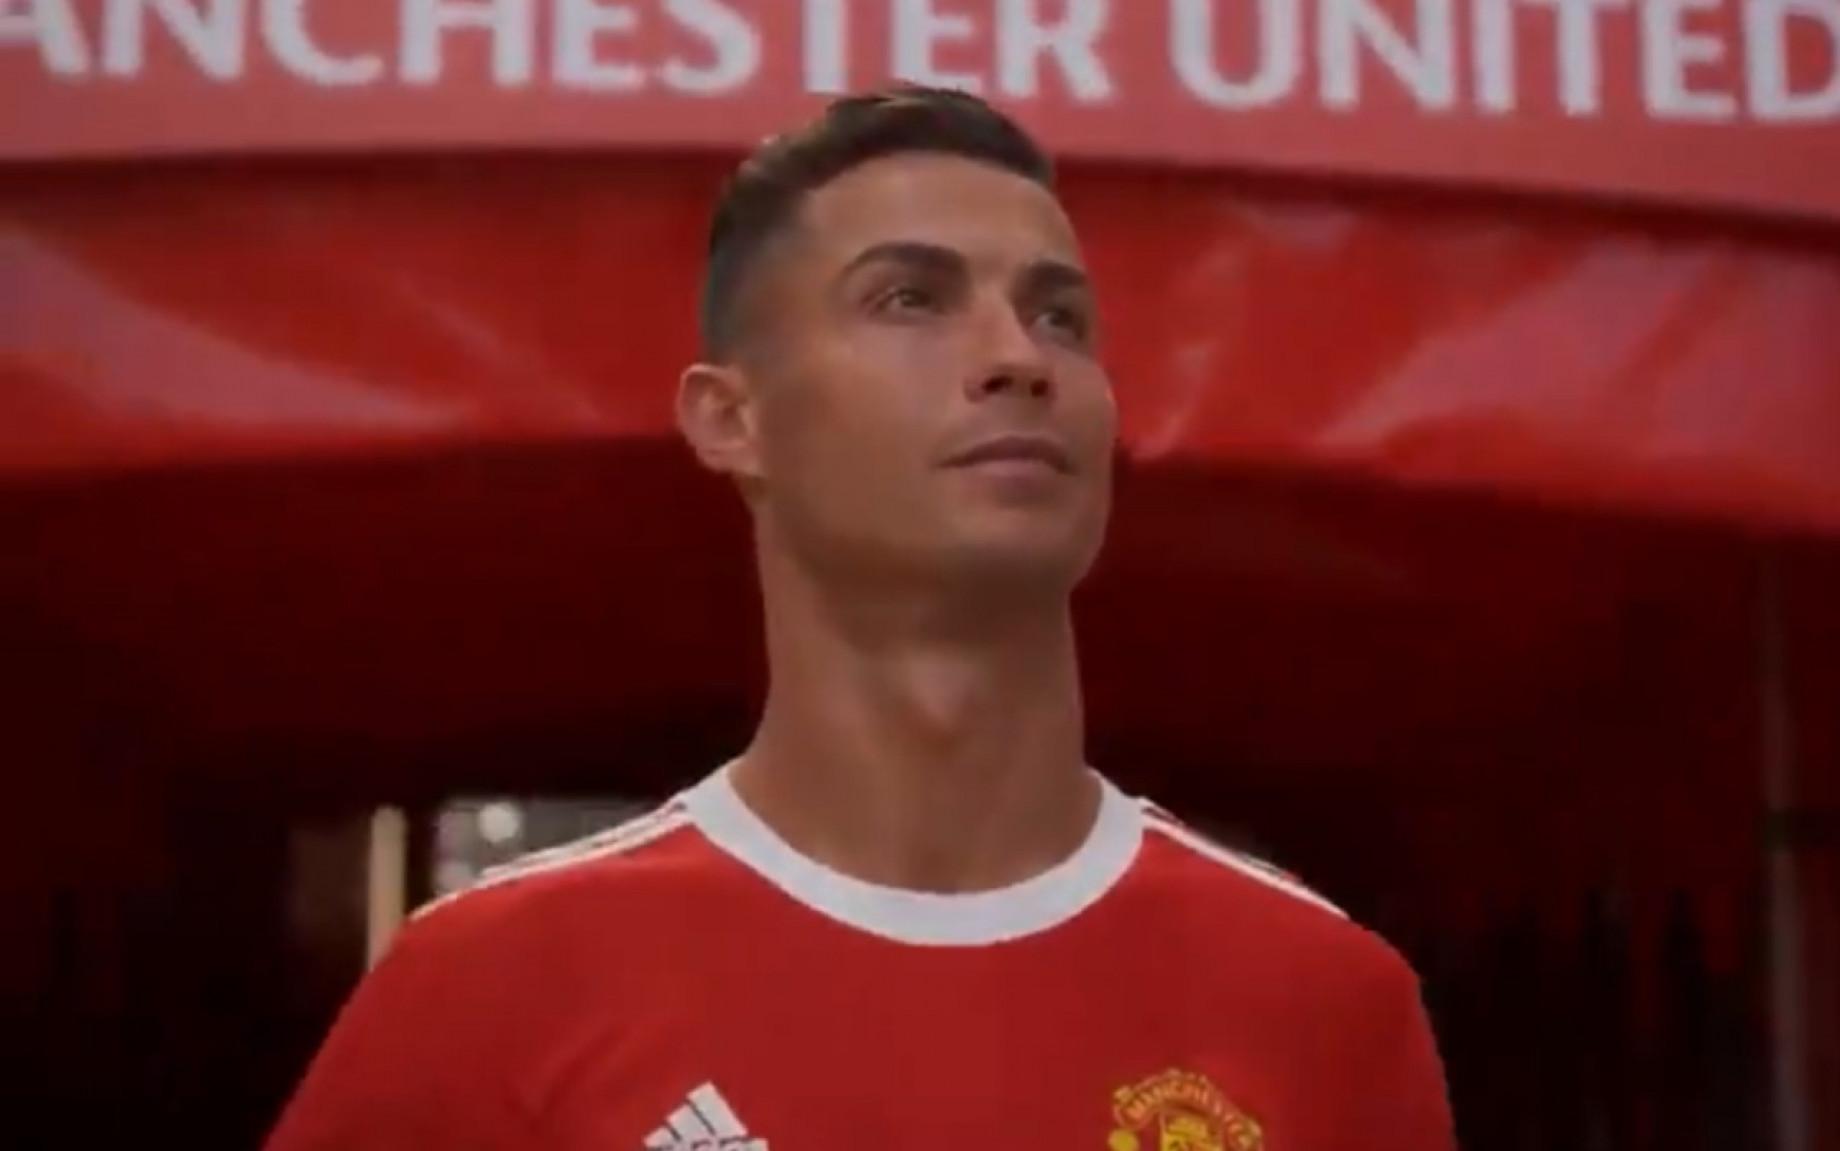 ronaldo4_manchester_united_screen_gpo.jpg